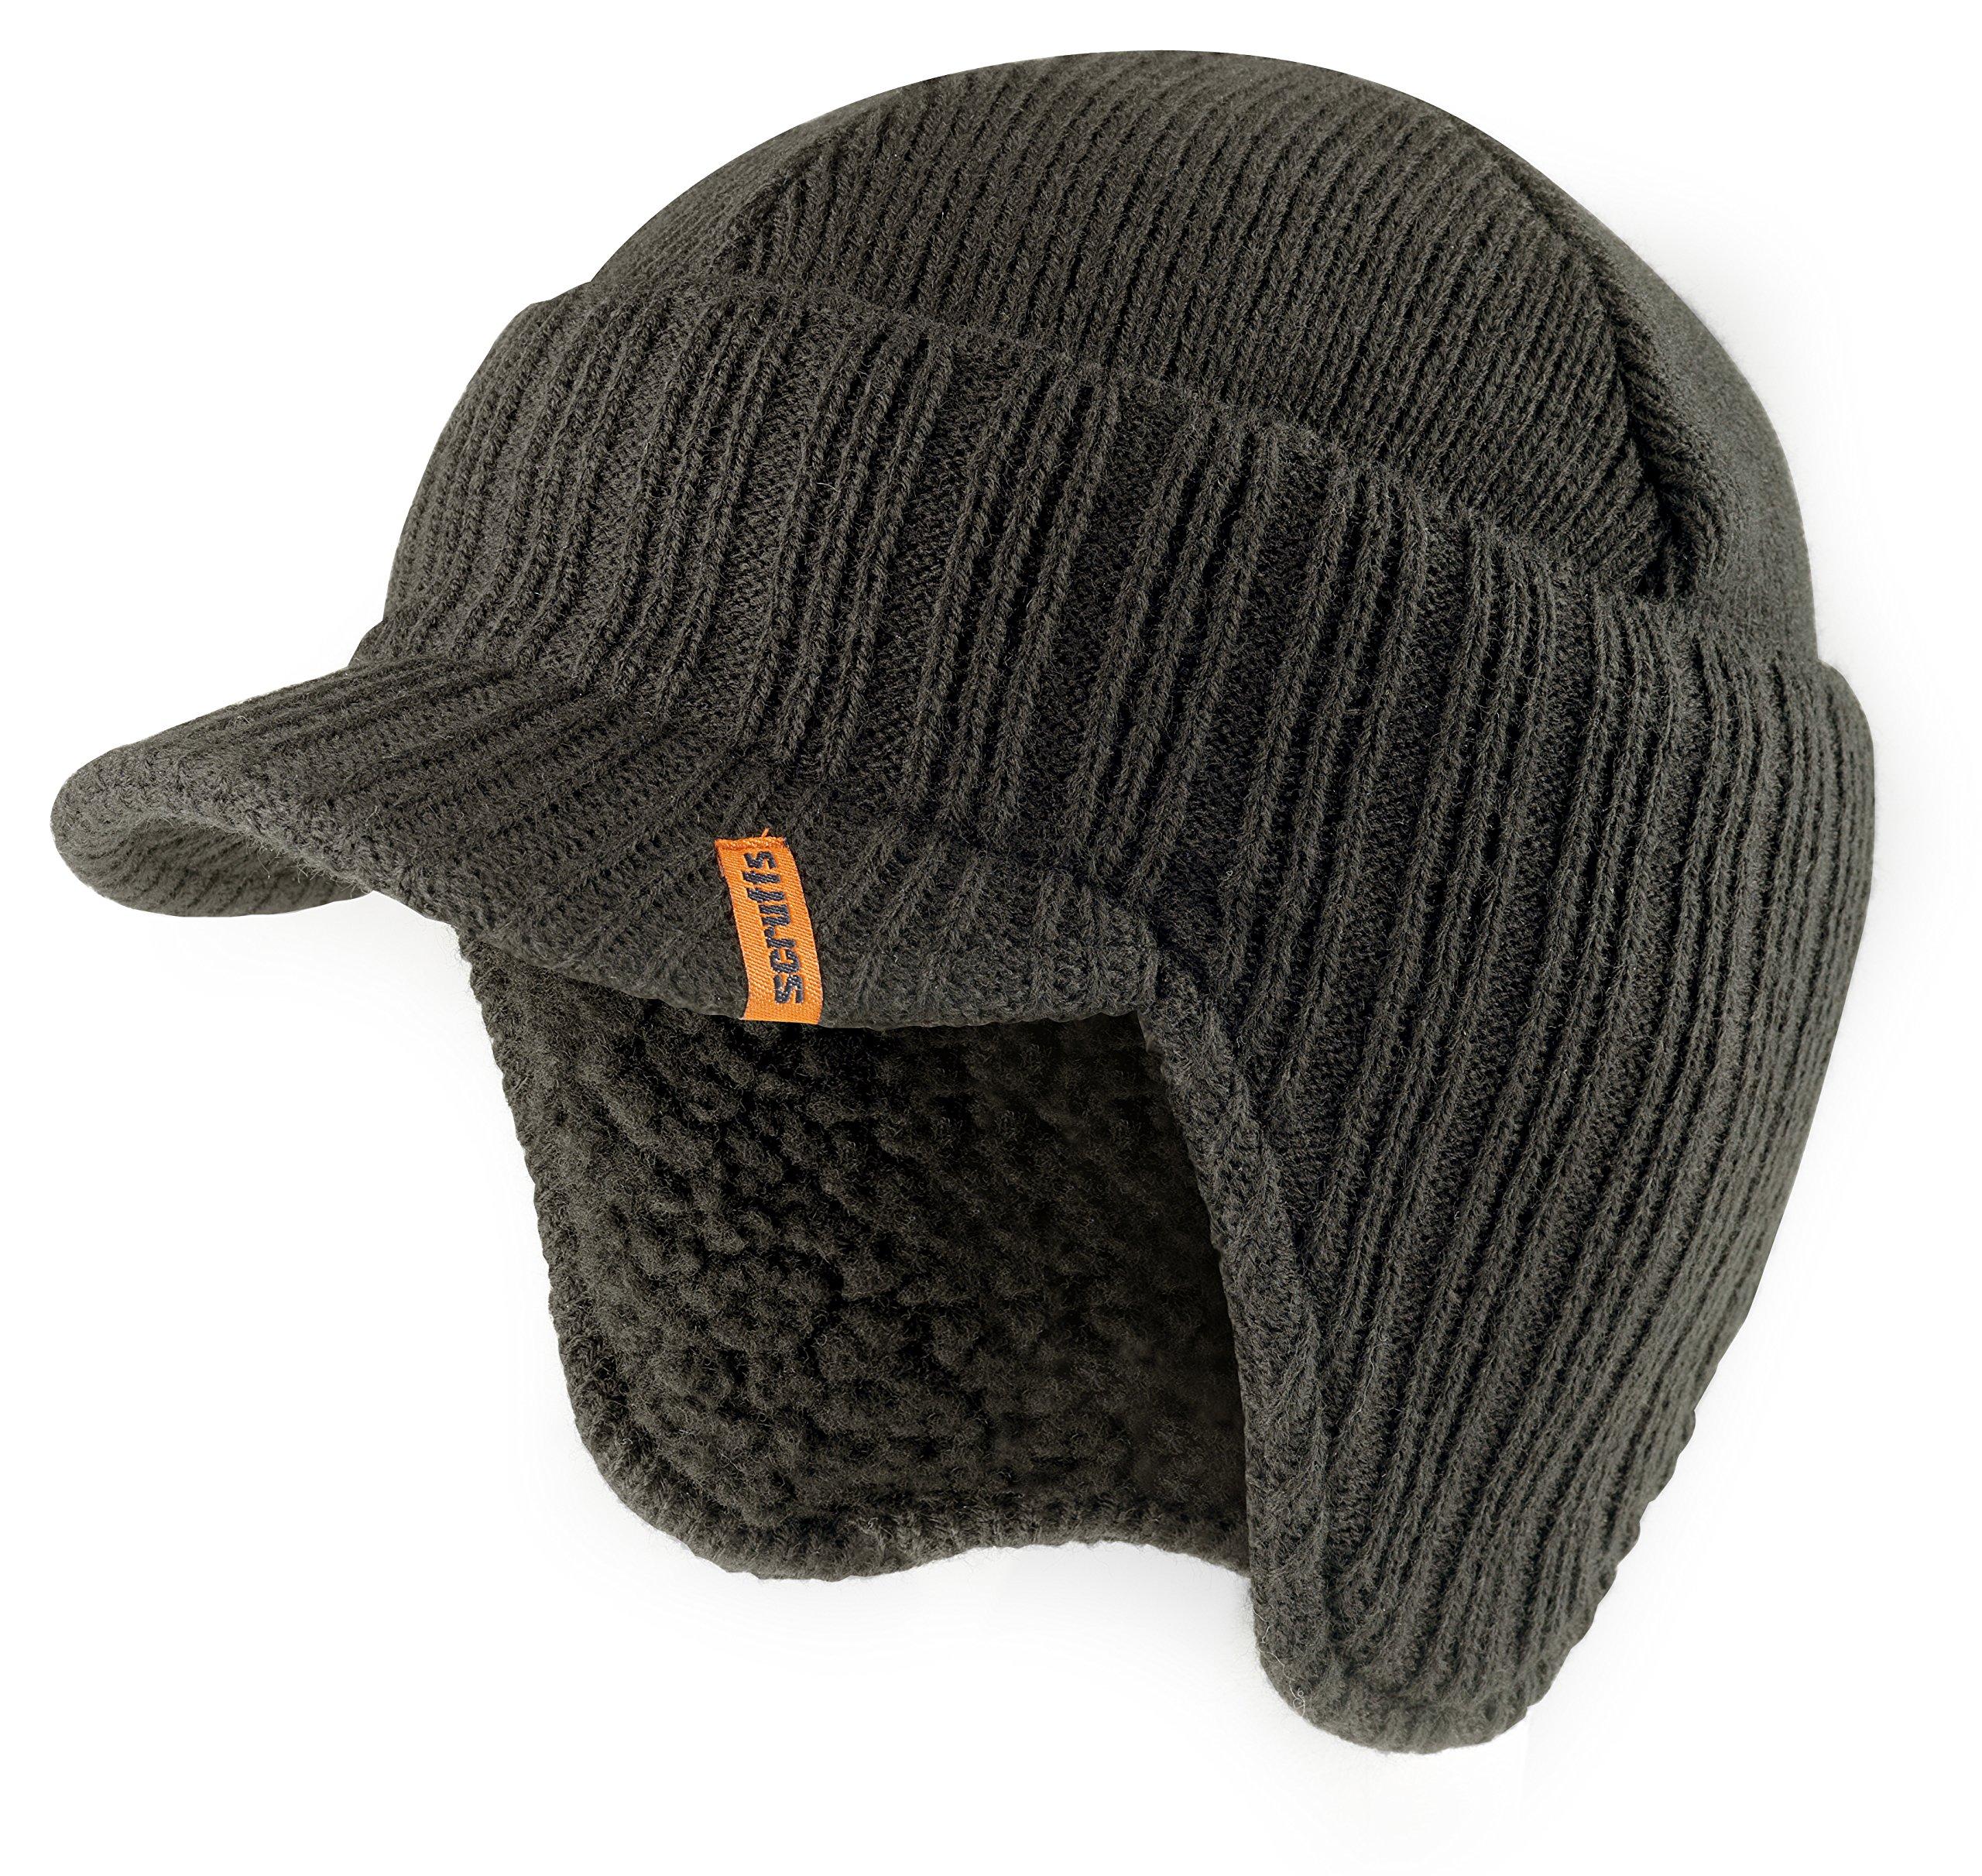 Scruffs Warm Winter Peaked Beanie Hat Black Thermal Insulated Outdoor Workwear